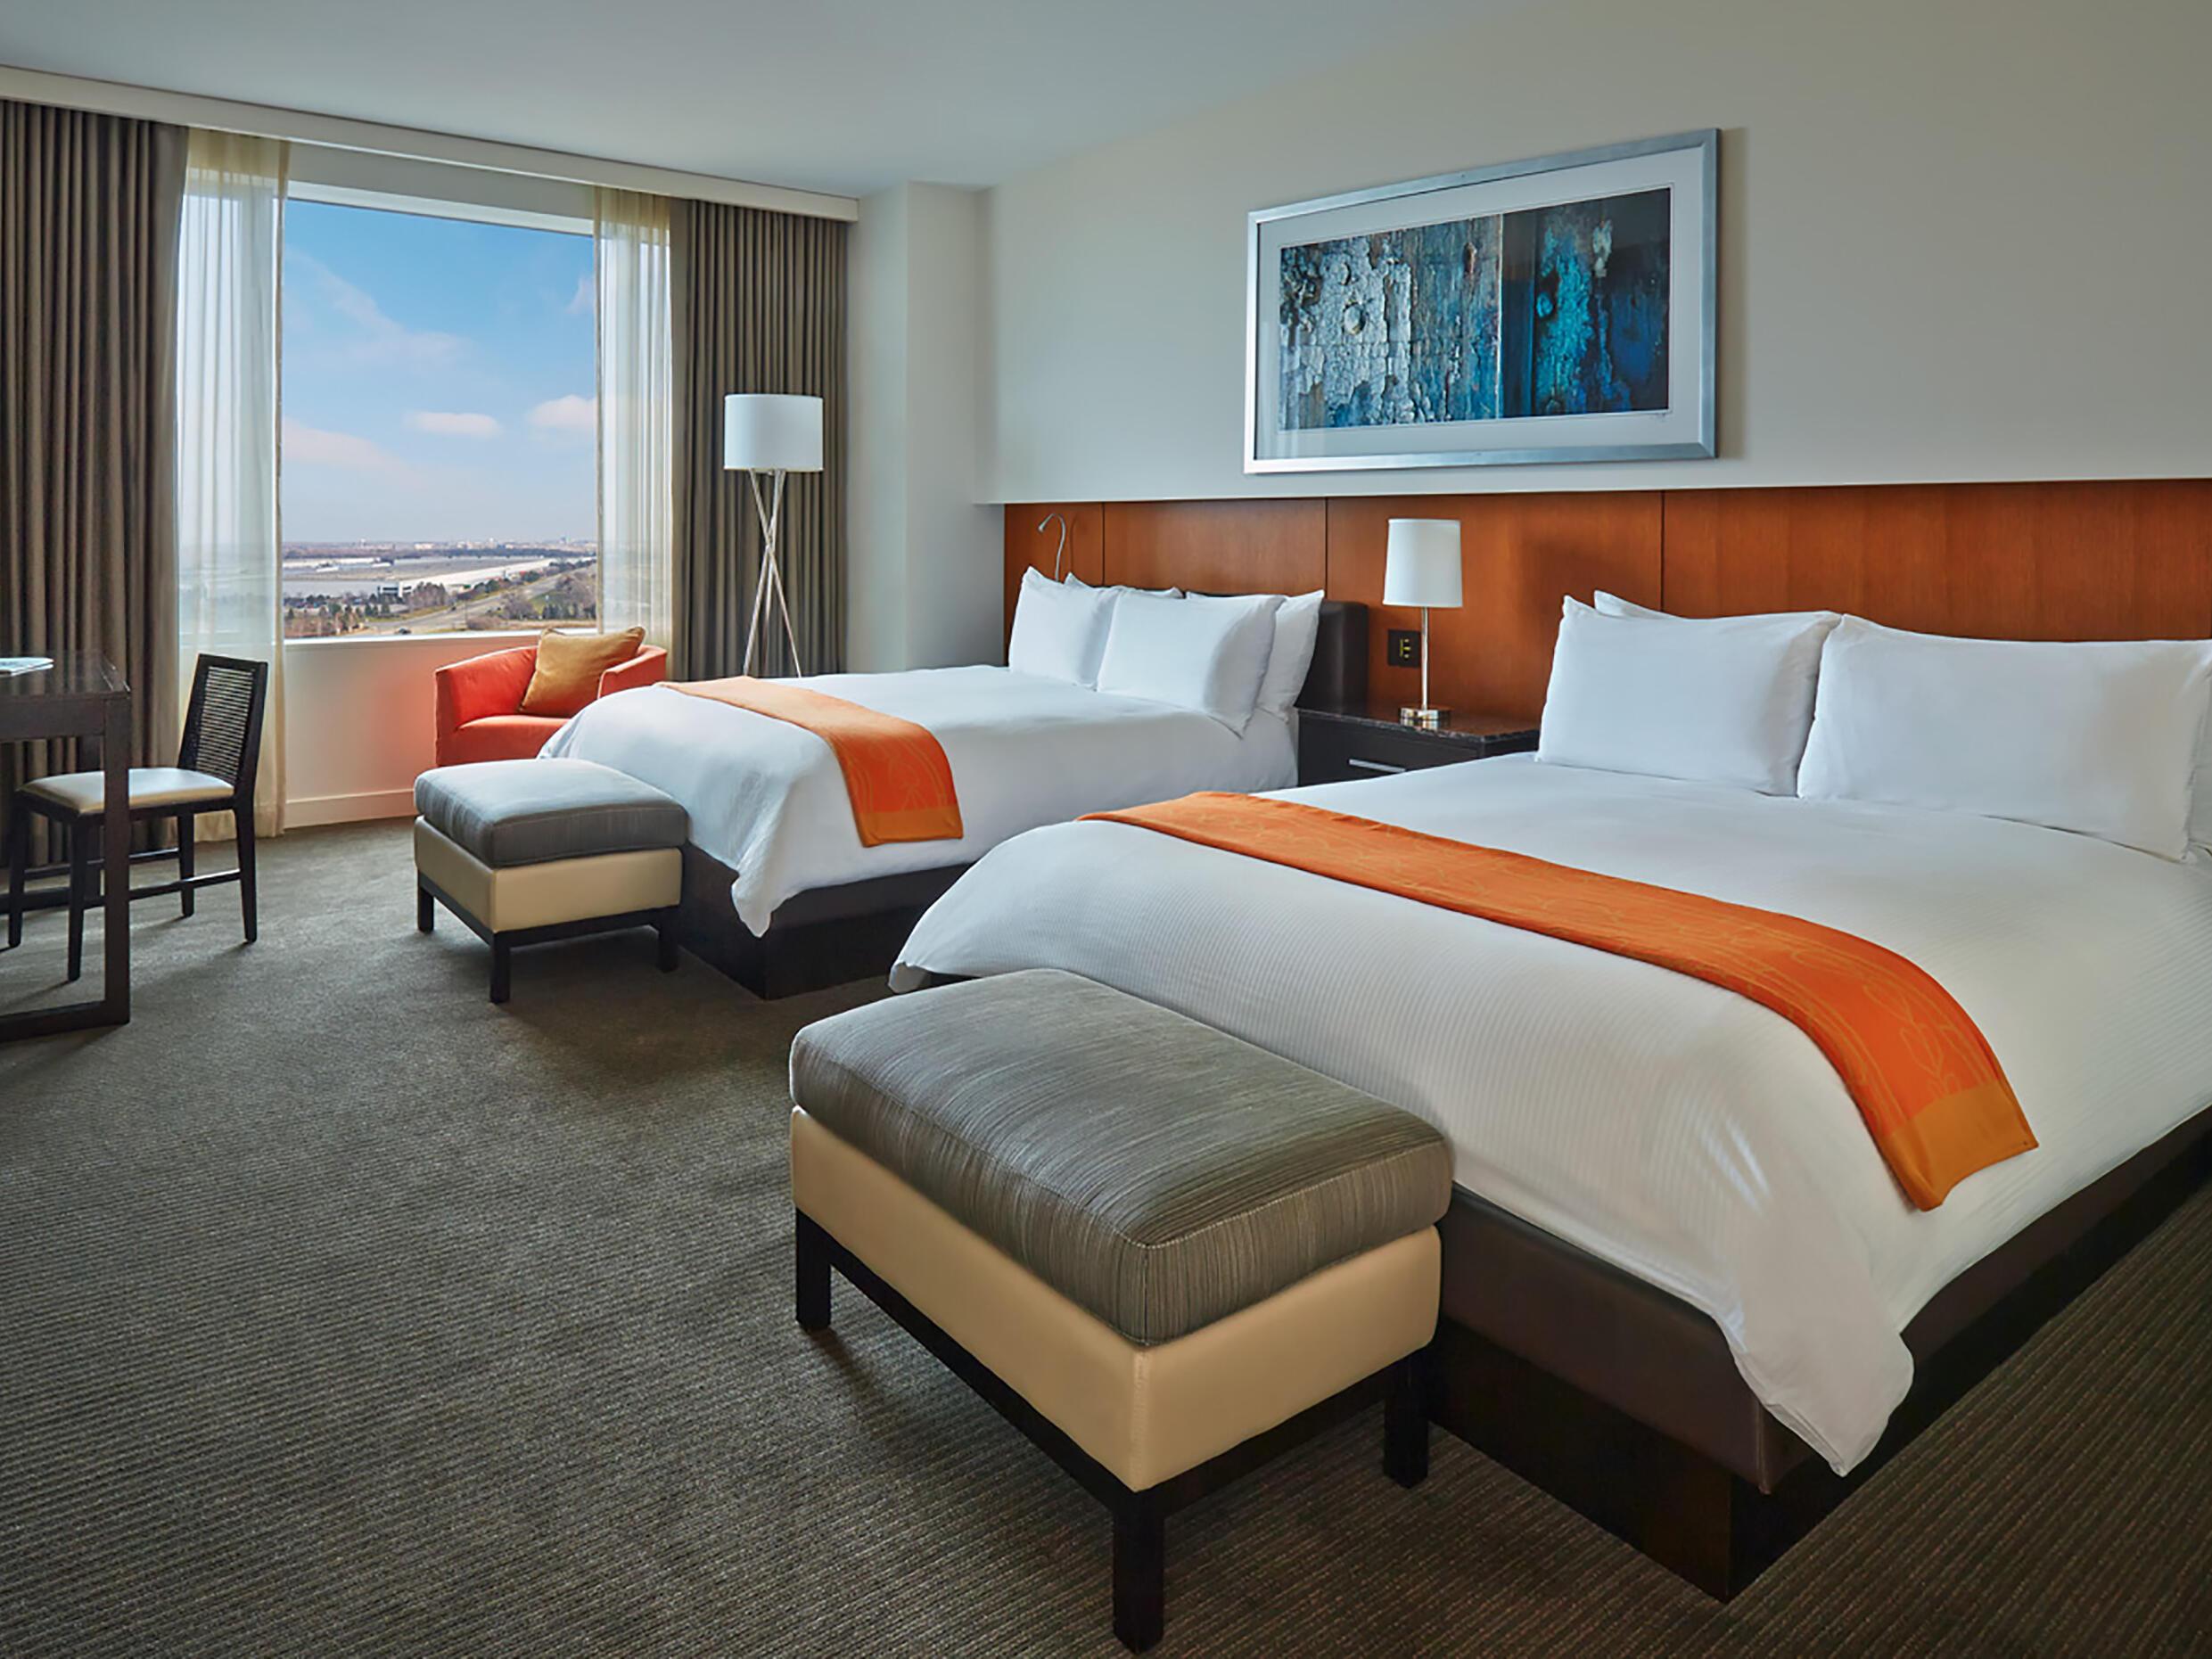 Hotel Arista Guest Room